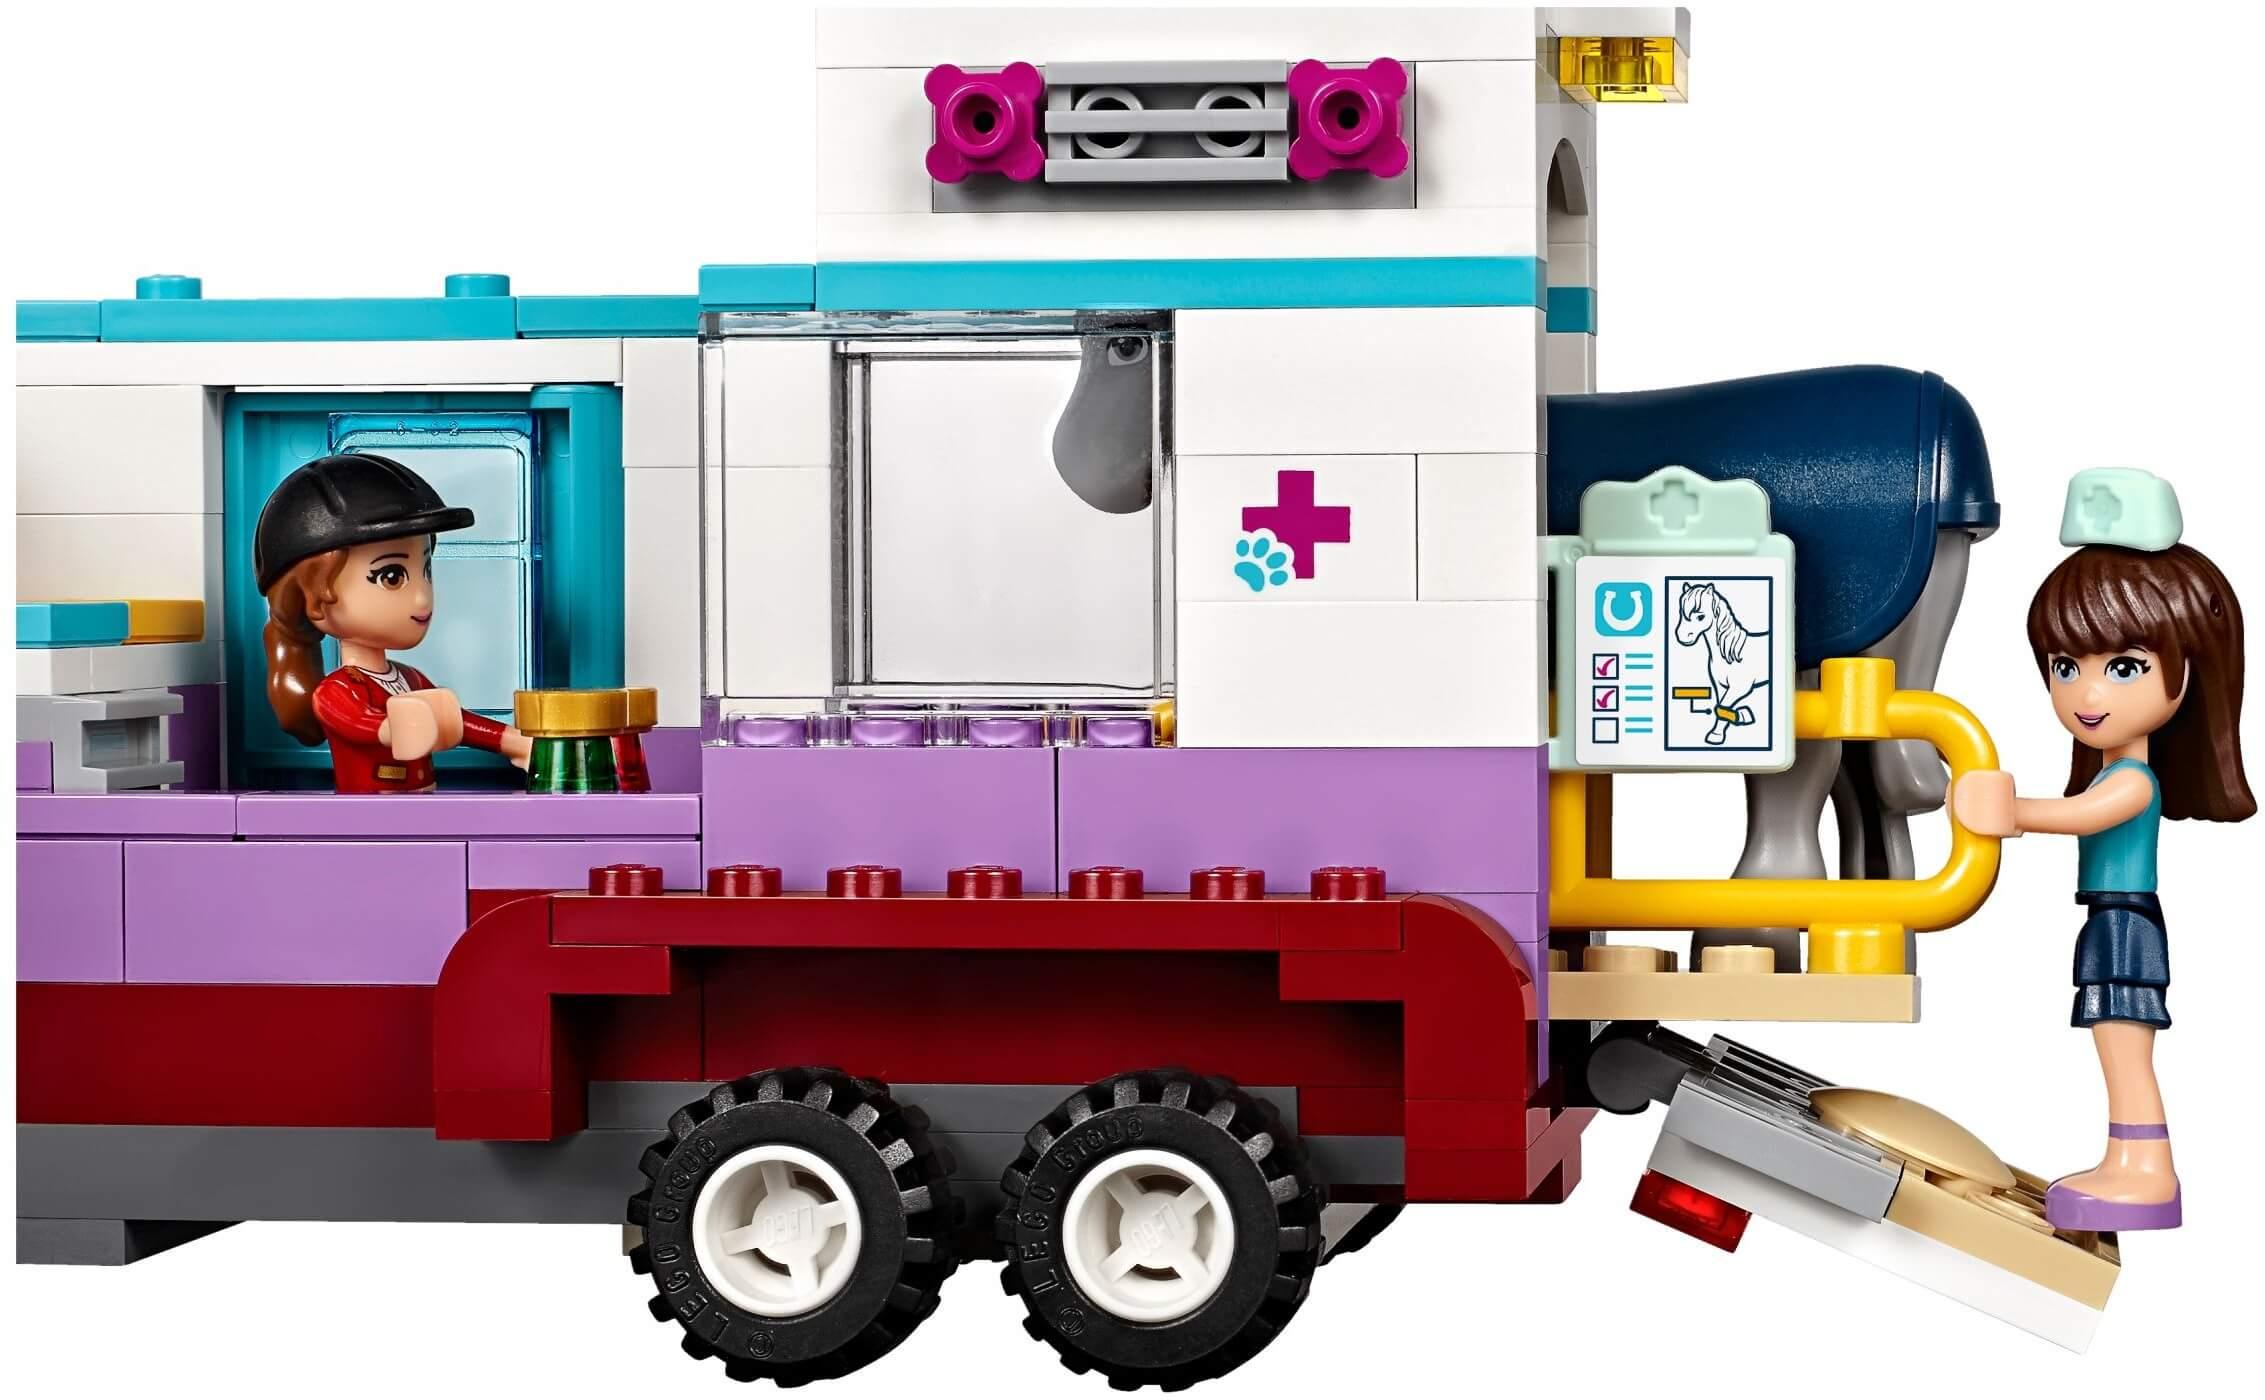 Mua đồ chơi LEGO 41125 - LEGO Friends 41125 - Xe Chăm Sóc Thú Cưng của Sophie (LEGO Friends Horse Vet Trailer 41125)